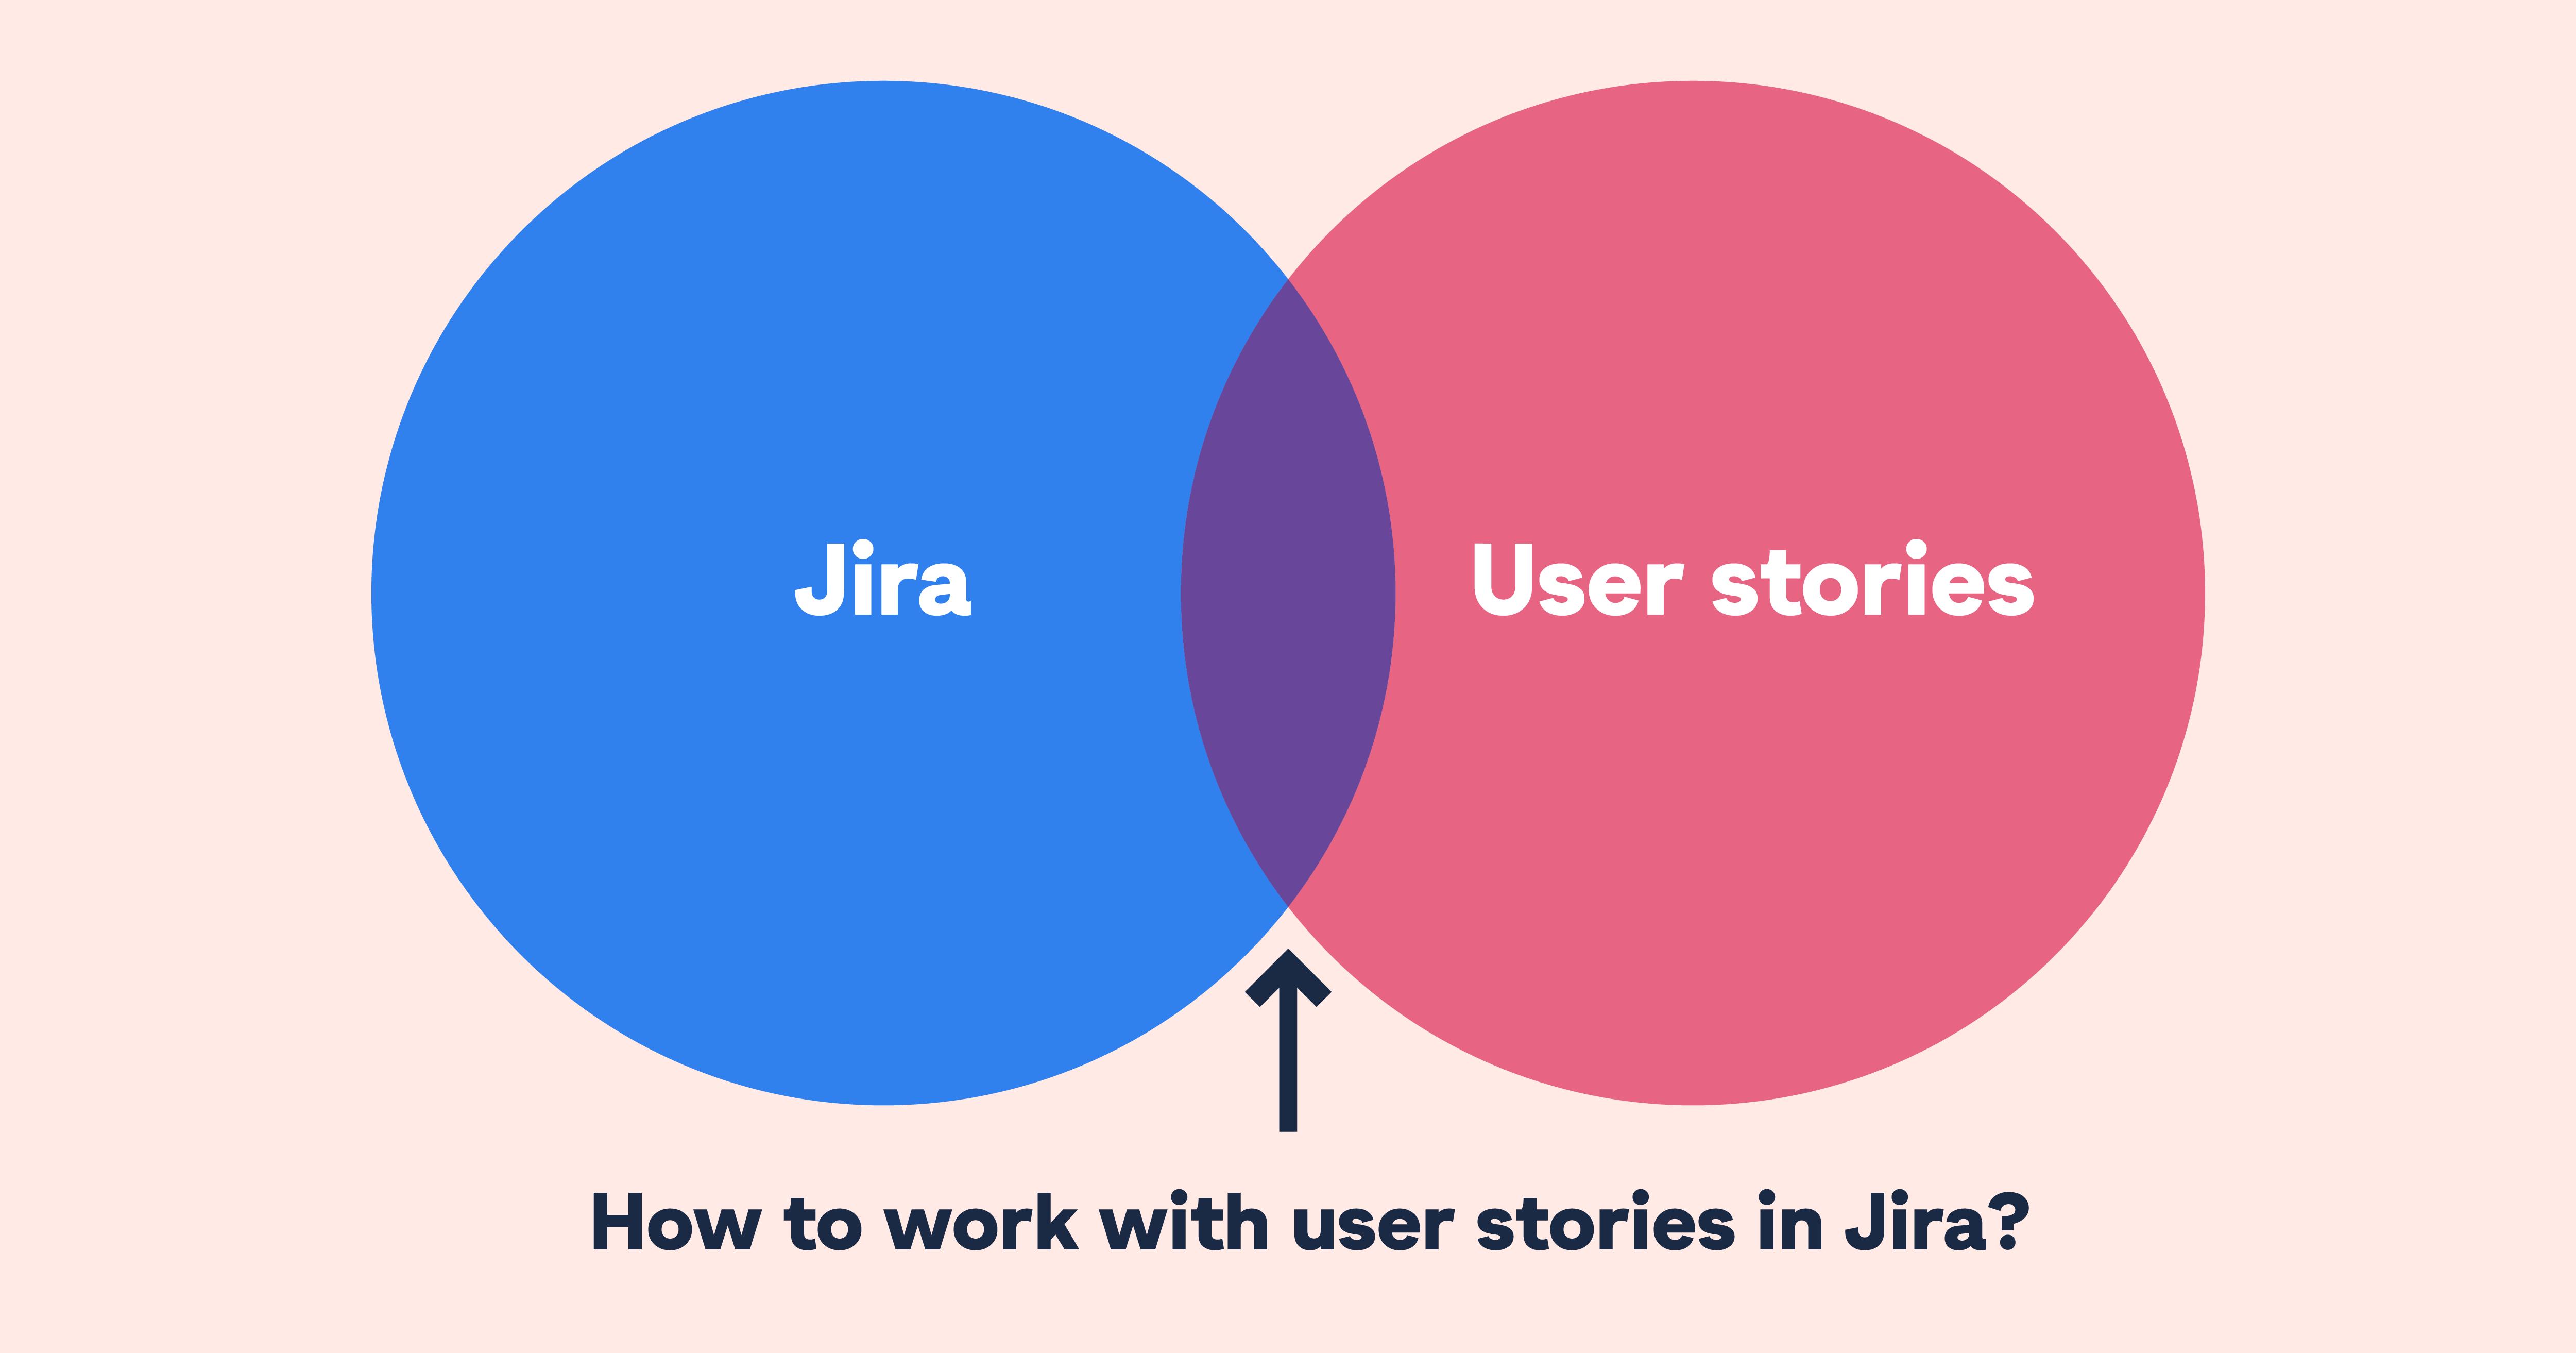 Jira and User stories venn diagram